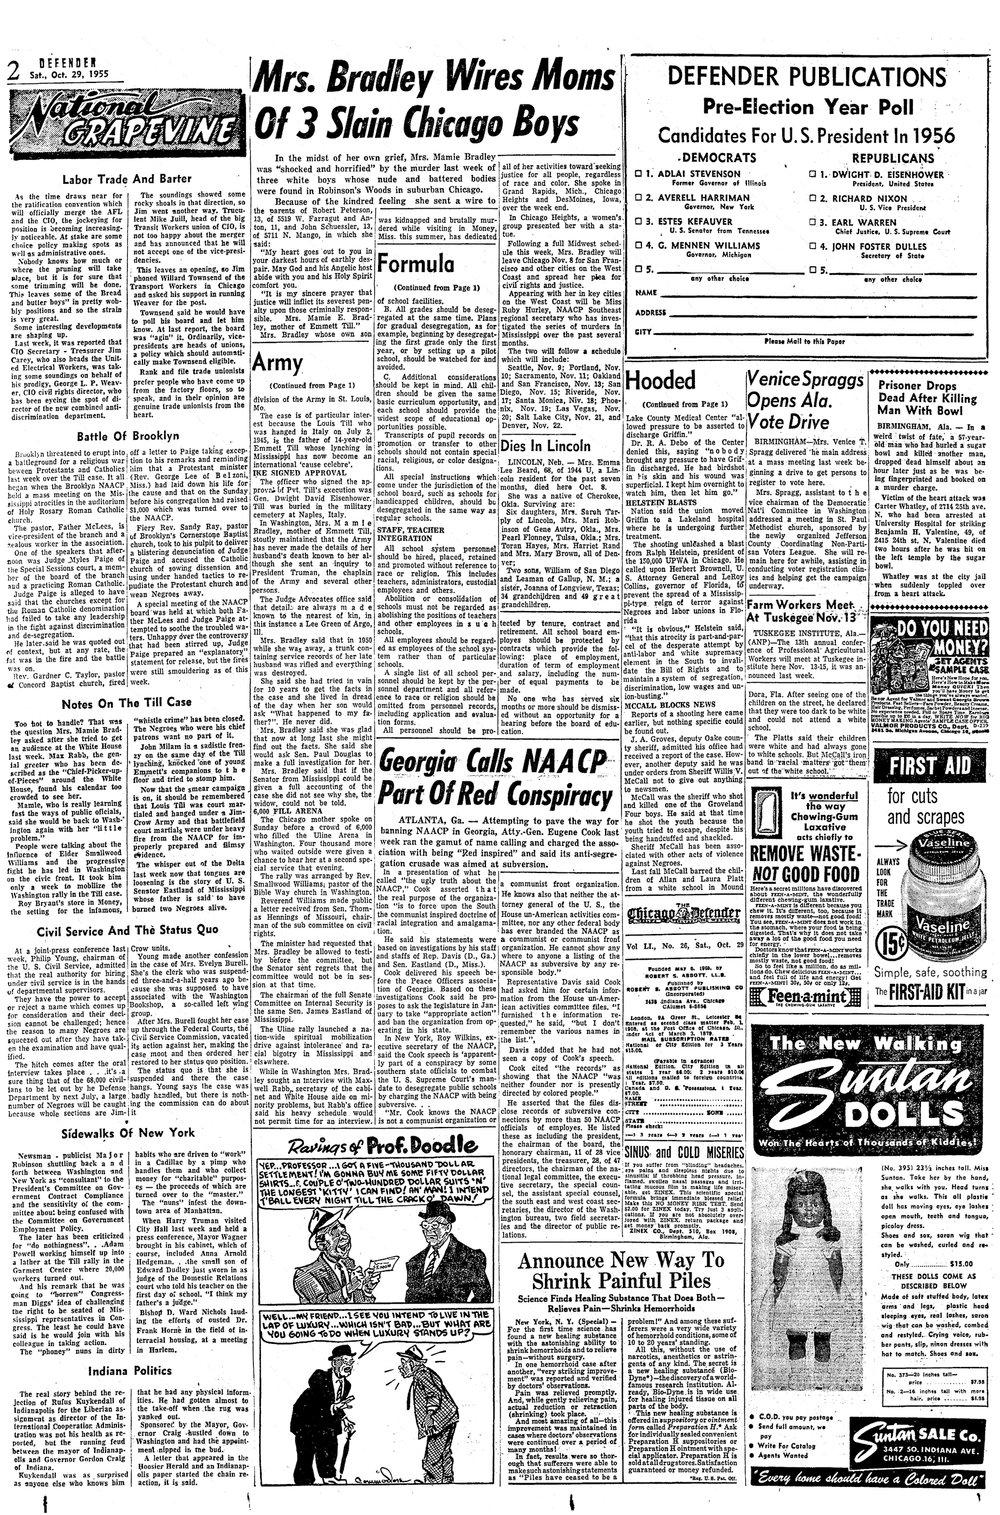 10.29.1955